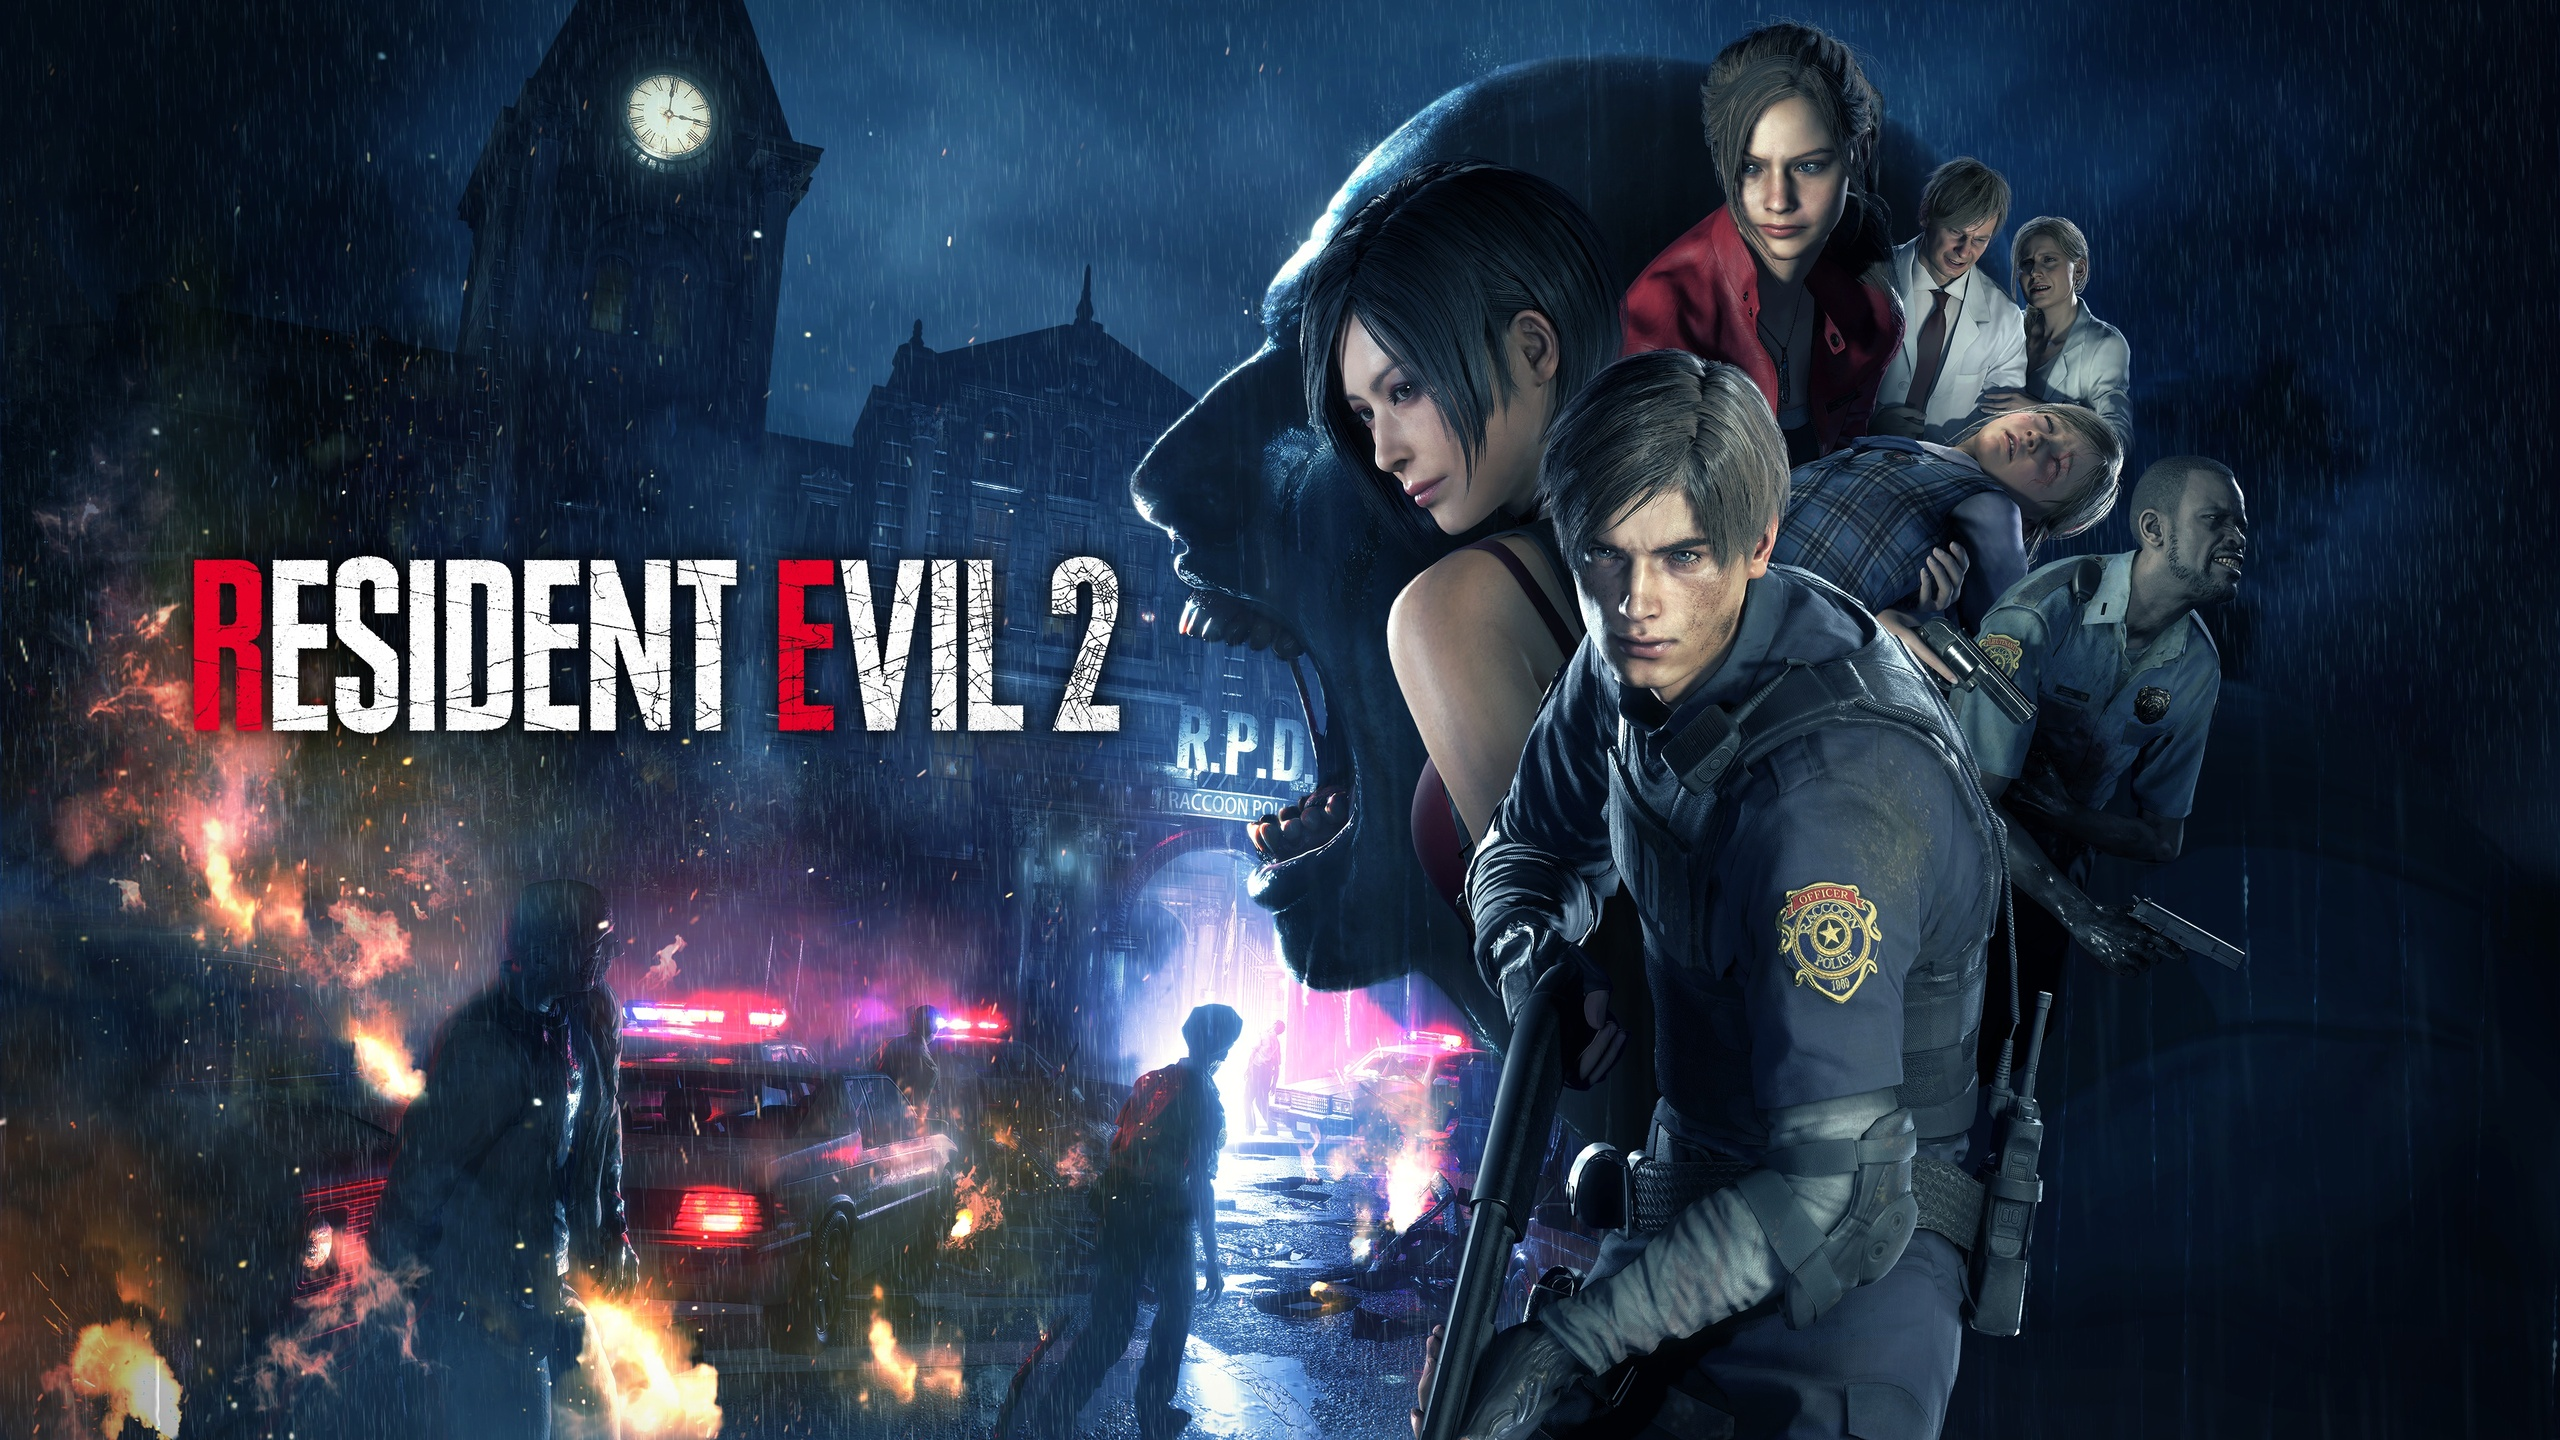 2560x1440 2019 Resident Evil 2 4k 1440P Resolution HD 4k ...